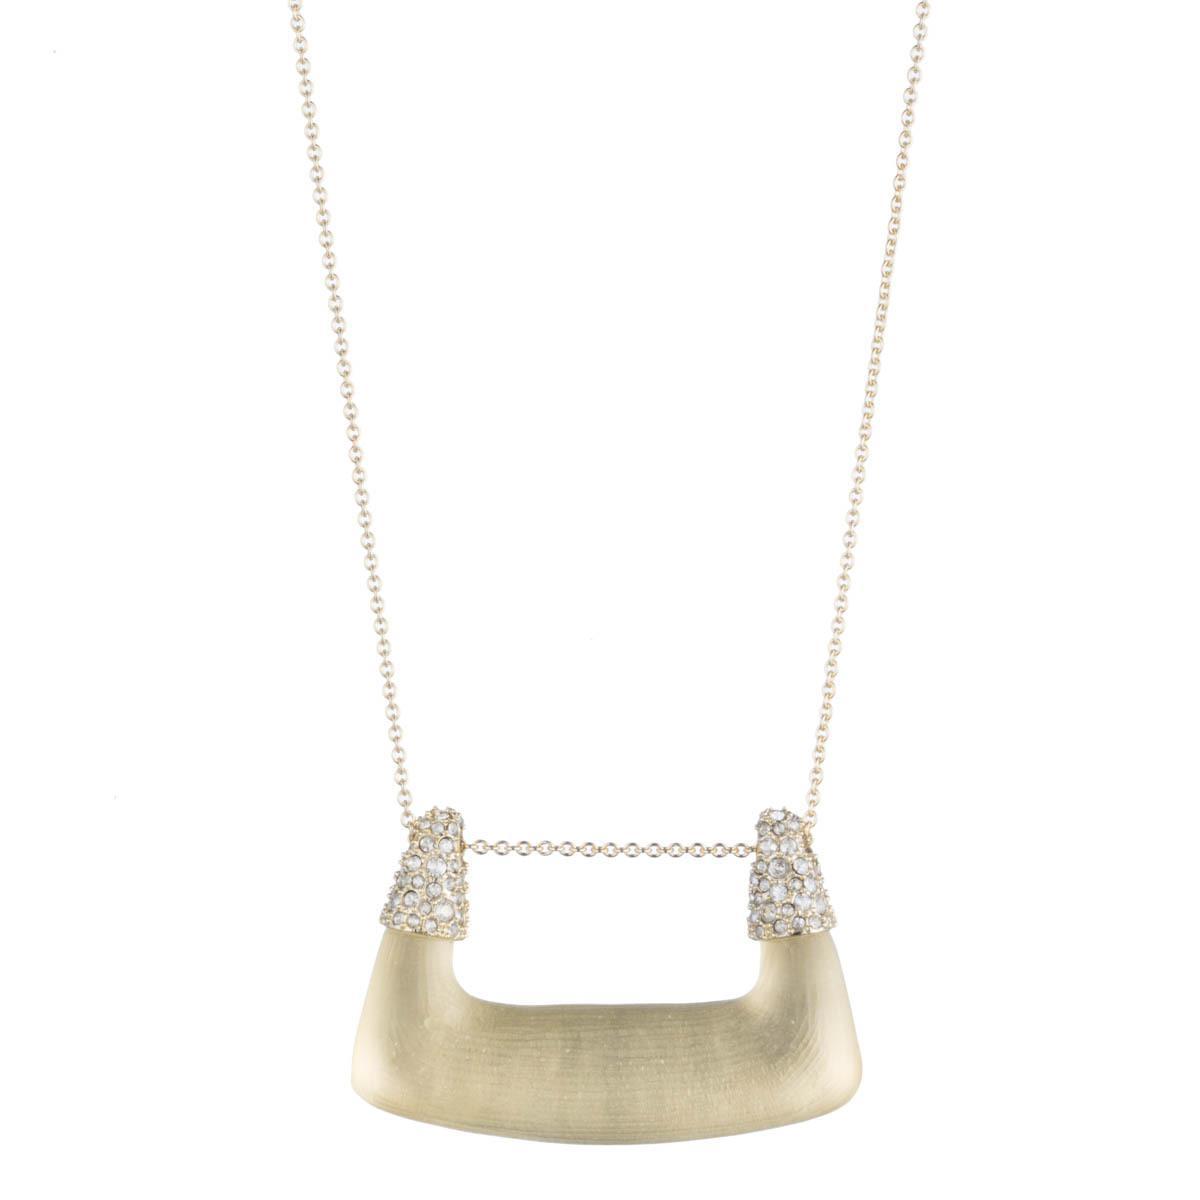 Alexis Bittar Crystal Encrusted Buckle Shape Pendant Necklace Ivory Zz0XK425